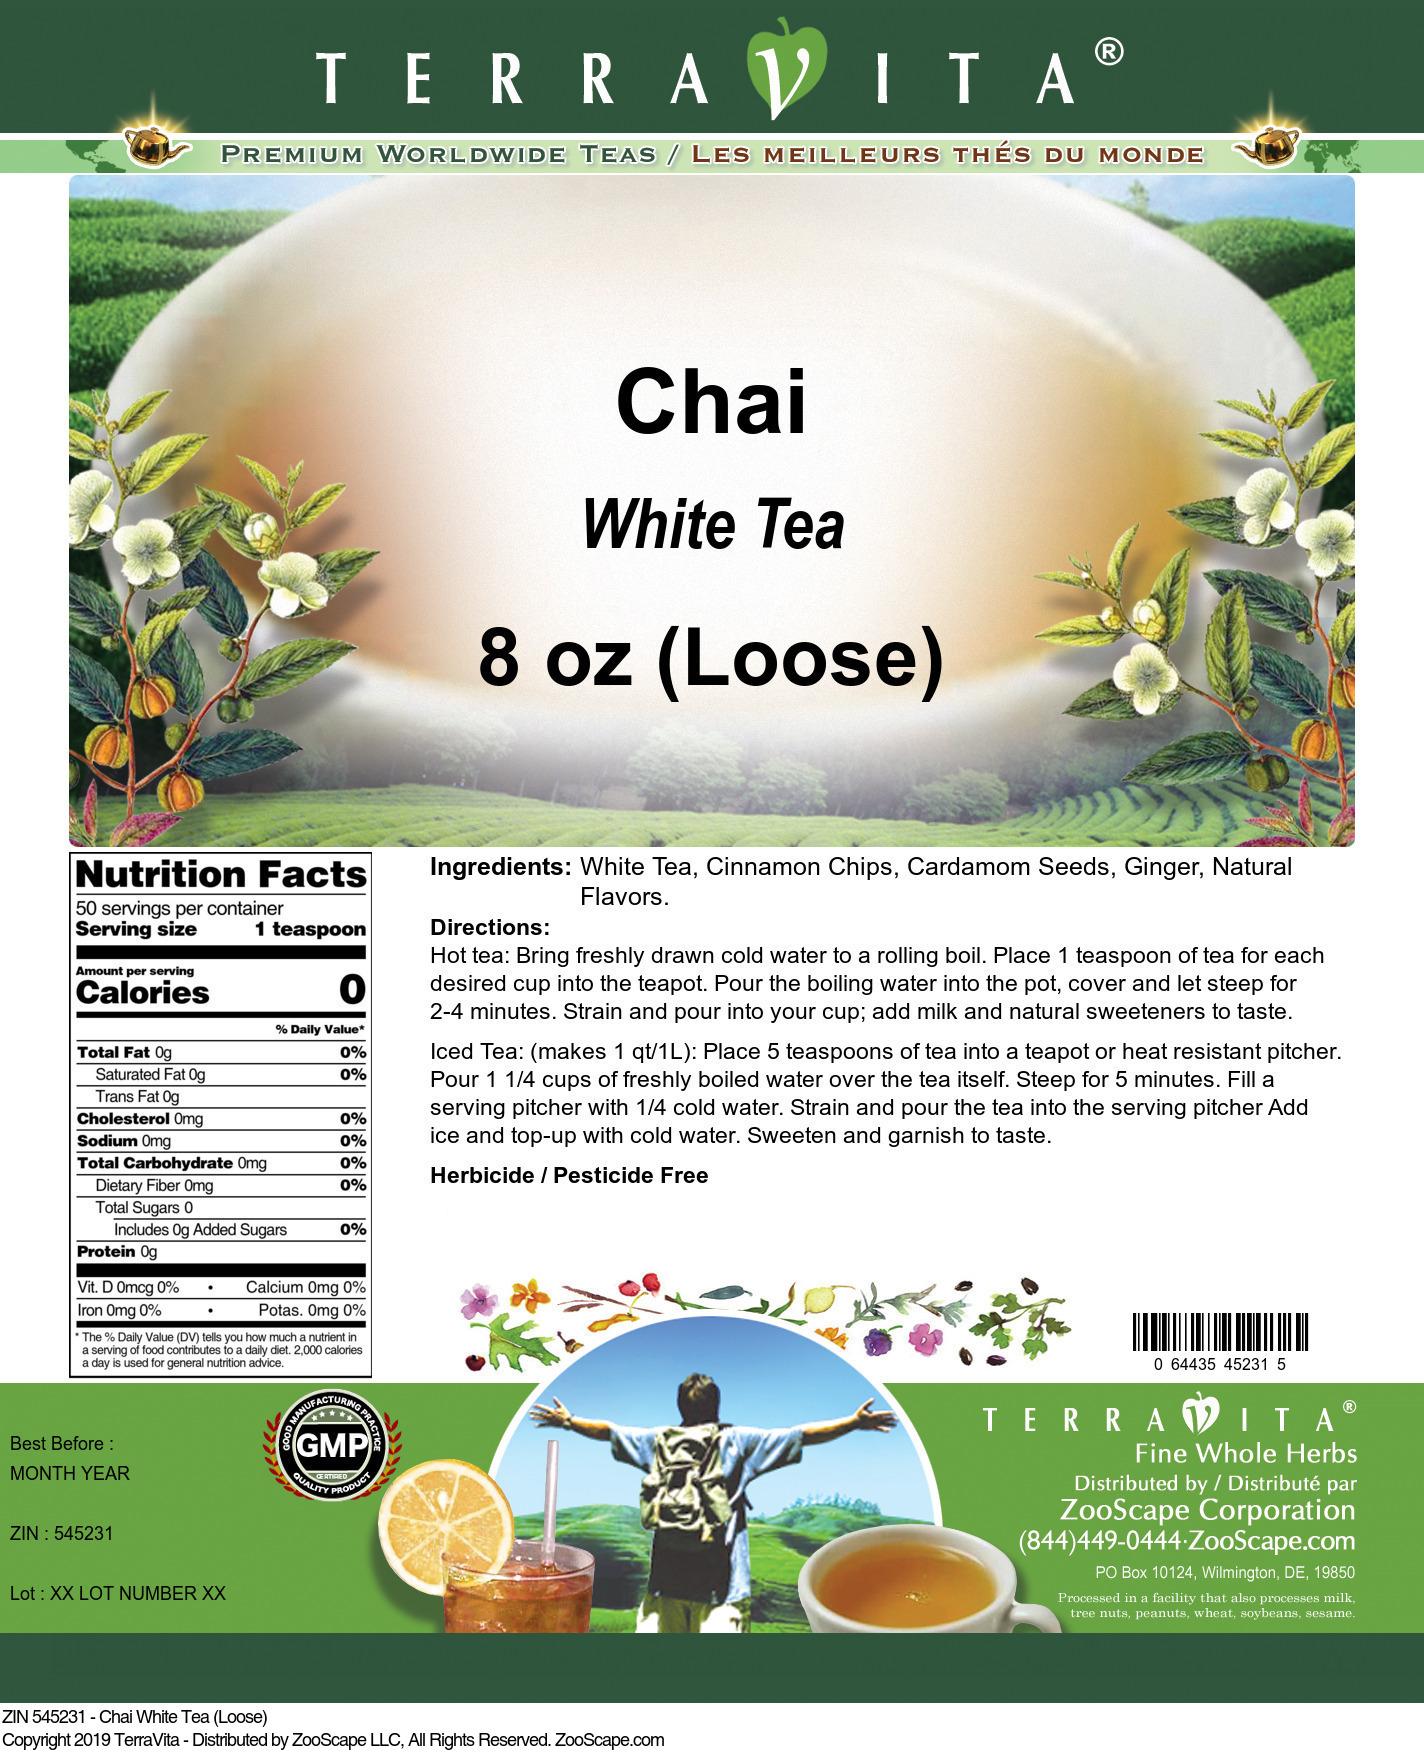 Chai White Tea (Loose)